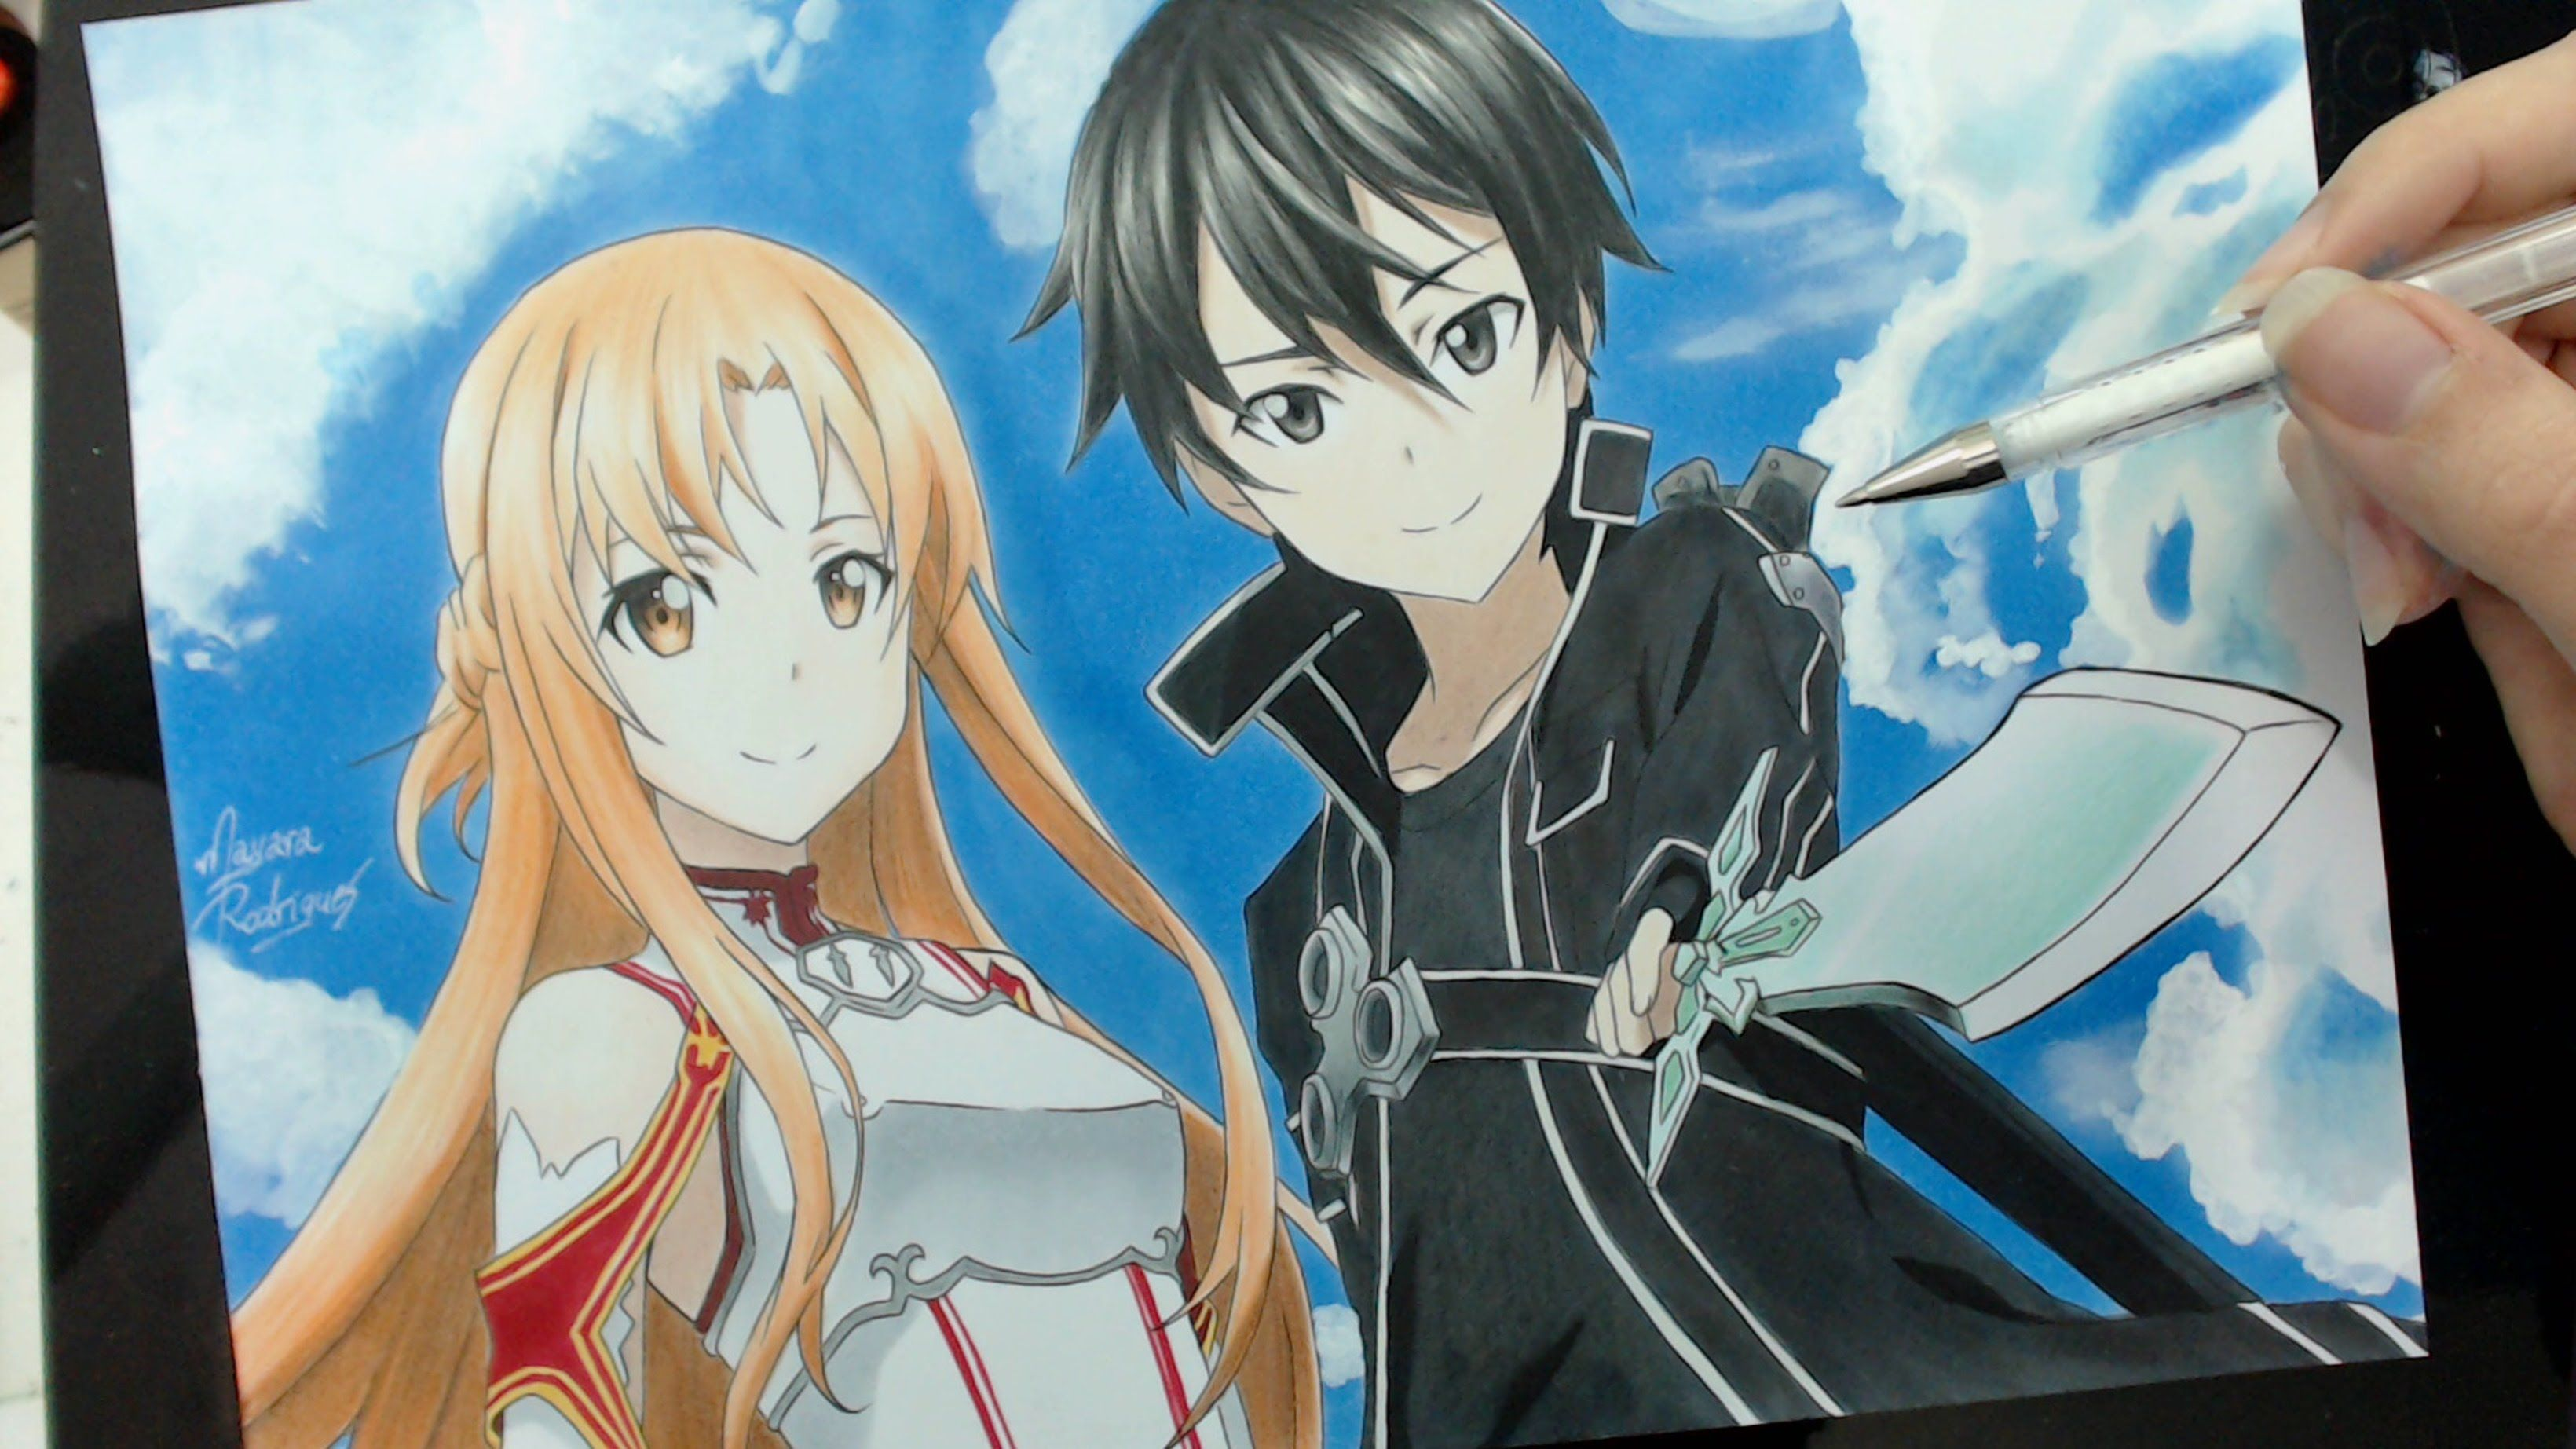 Dress up games favourites by asuna and kirito on deviantart - Speed Drawing Asuna And Kirito Sword Art Online